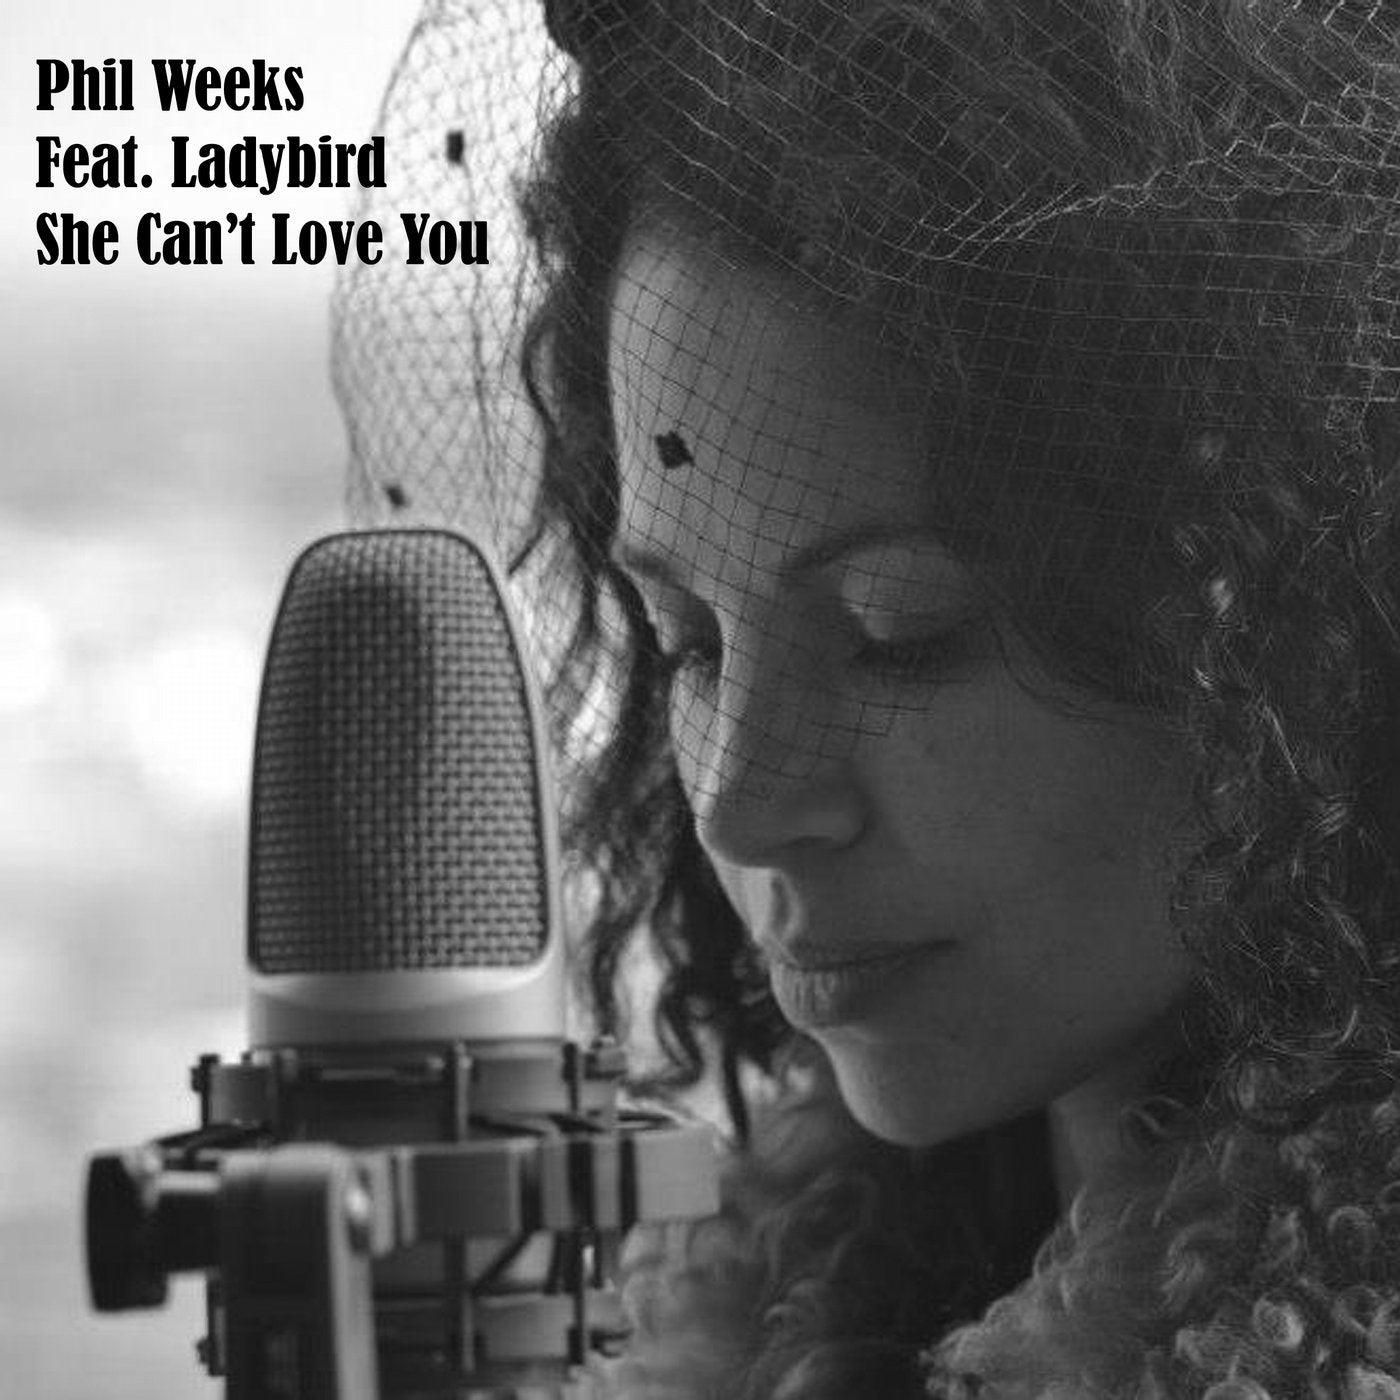 She Can't Love You (Original Mix)